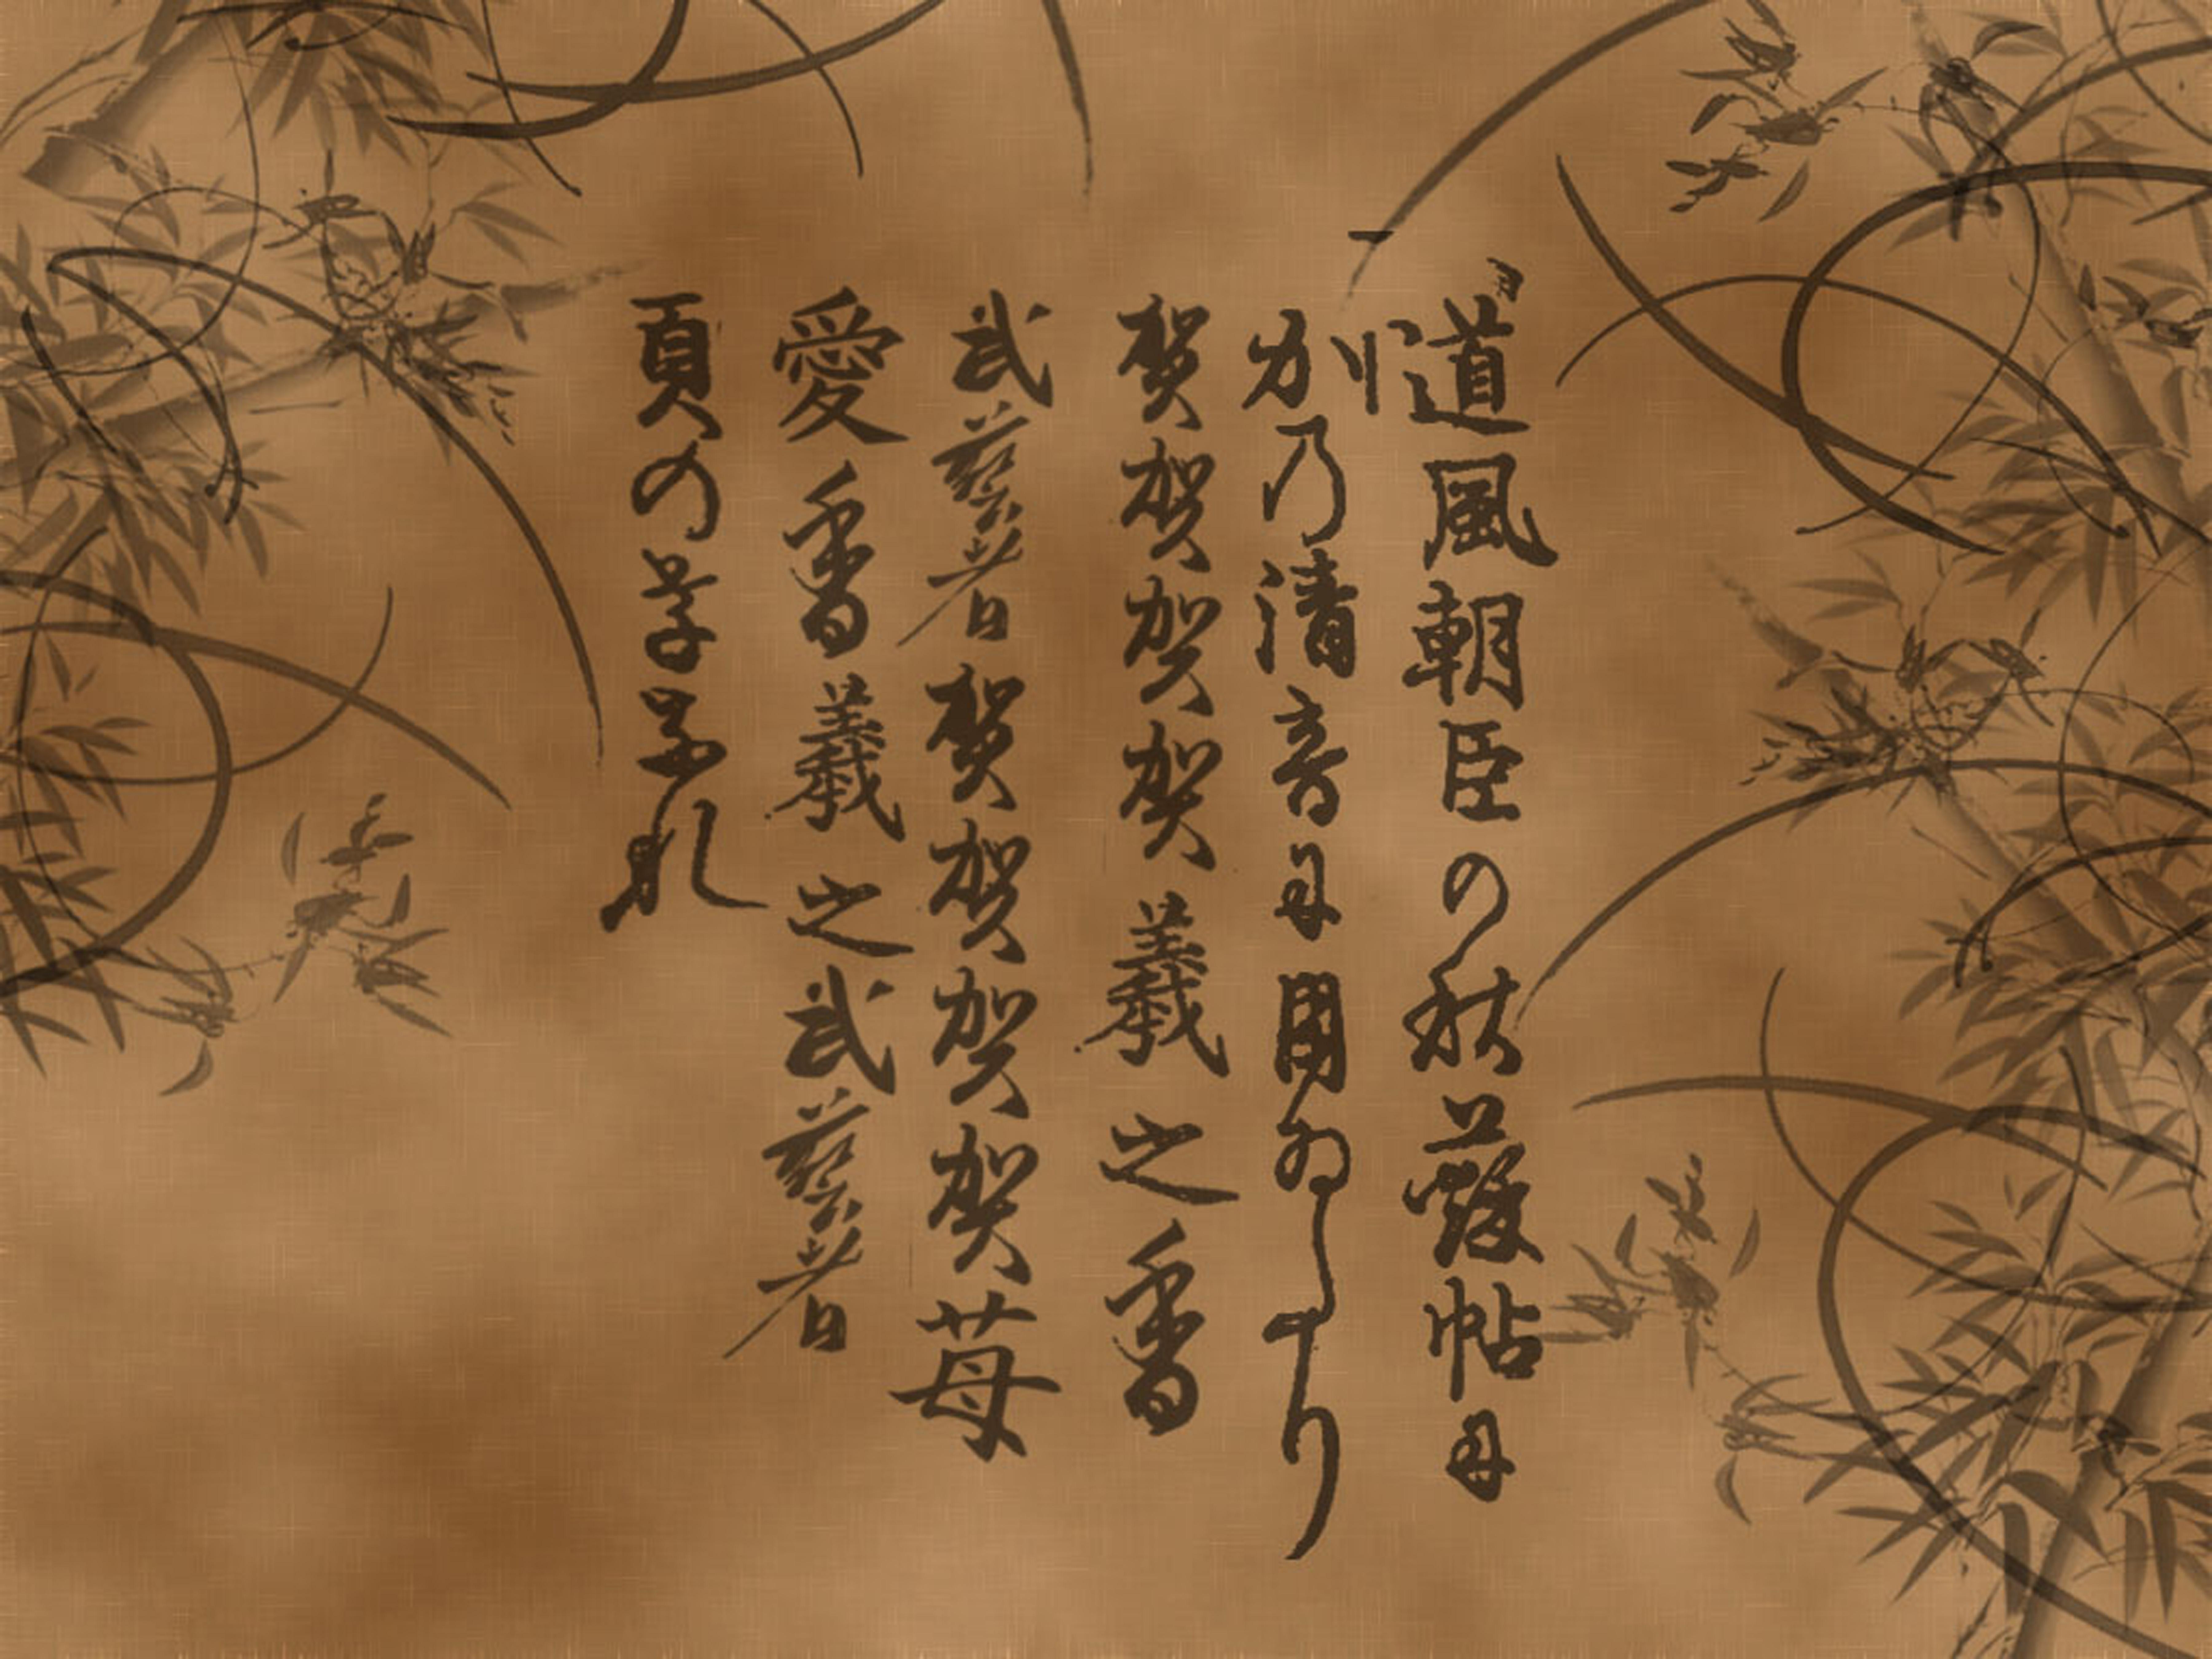 http://fc07.deviantart.net/fs40/f/2009/029/5/8/Japanese_Scroll_Wallpaper_by_yami_kitsune.jpg